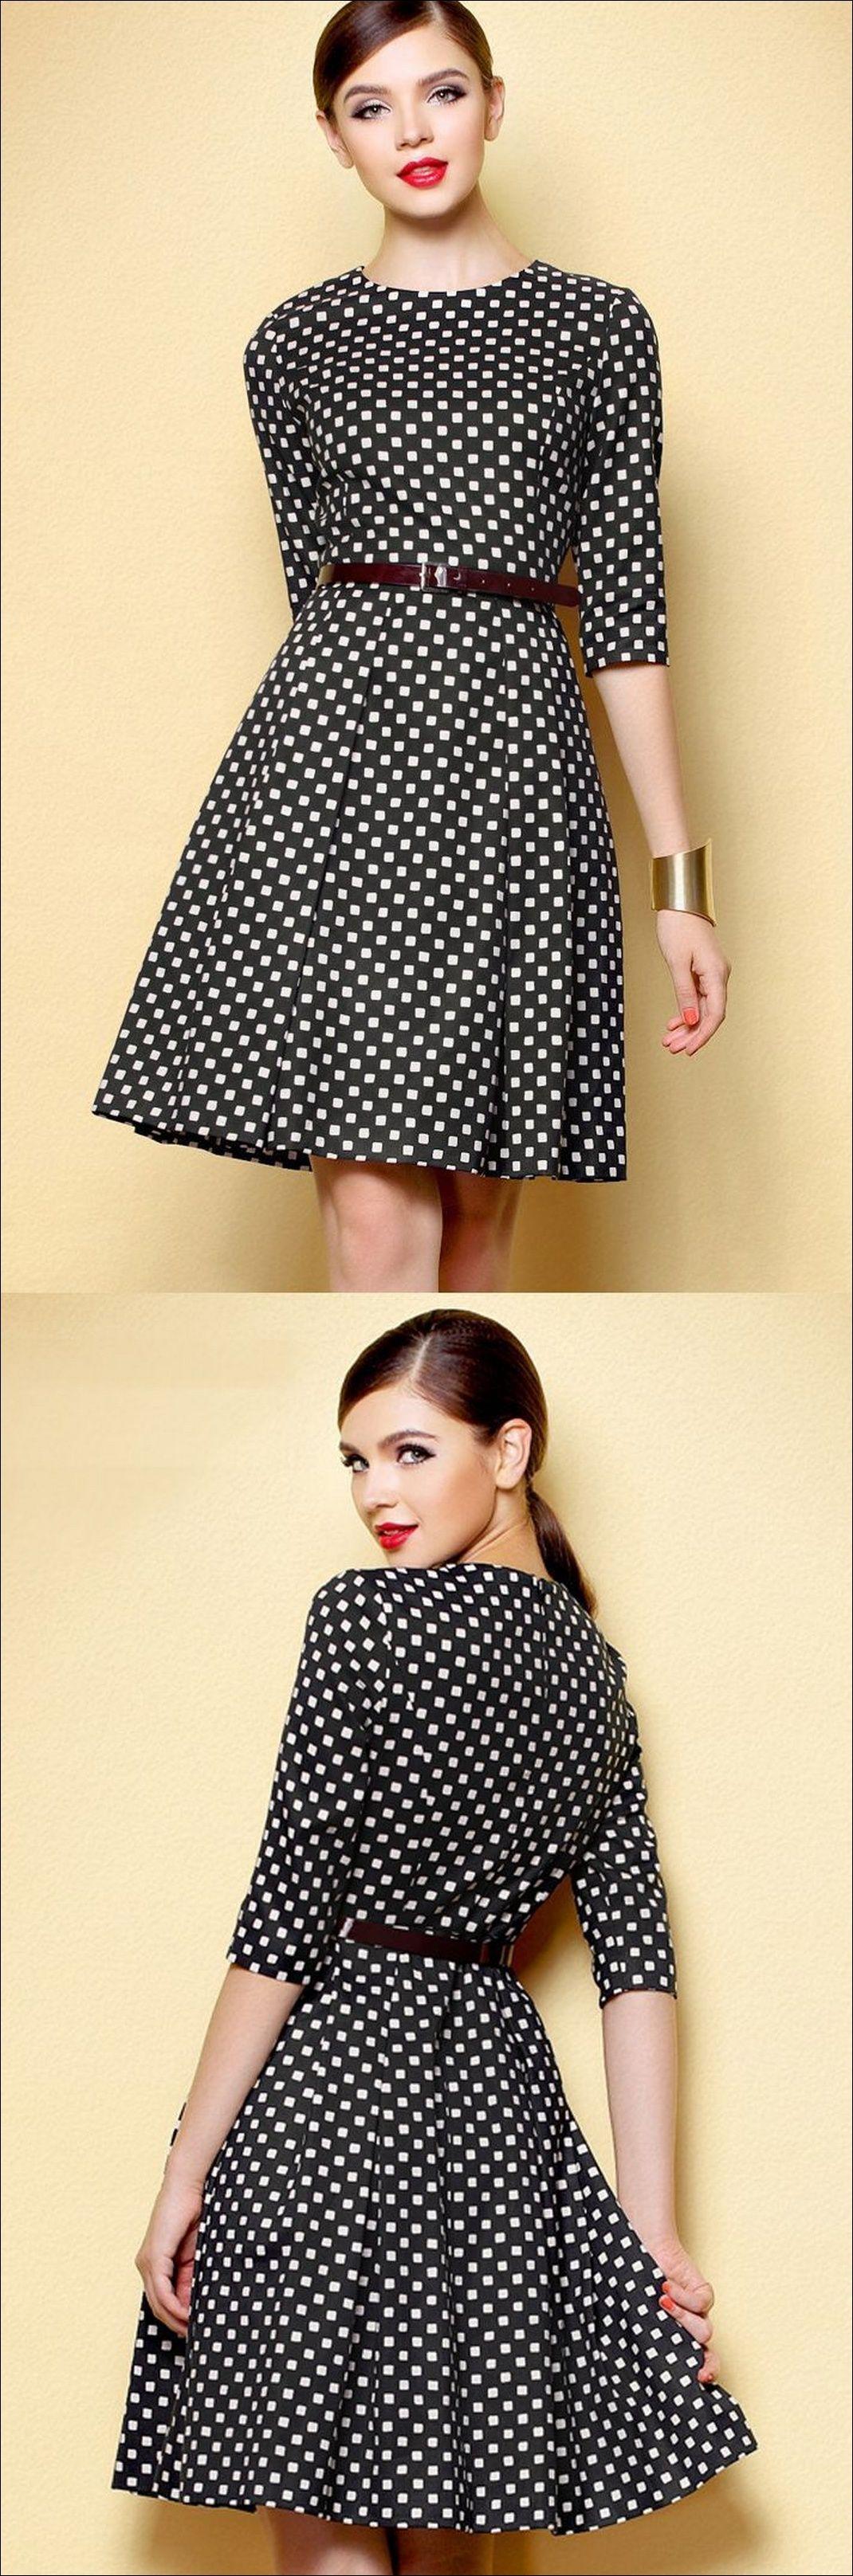 111 Inspired Polka Dot Dresses Make You Look Fashionable